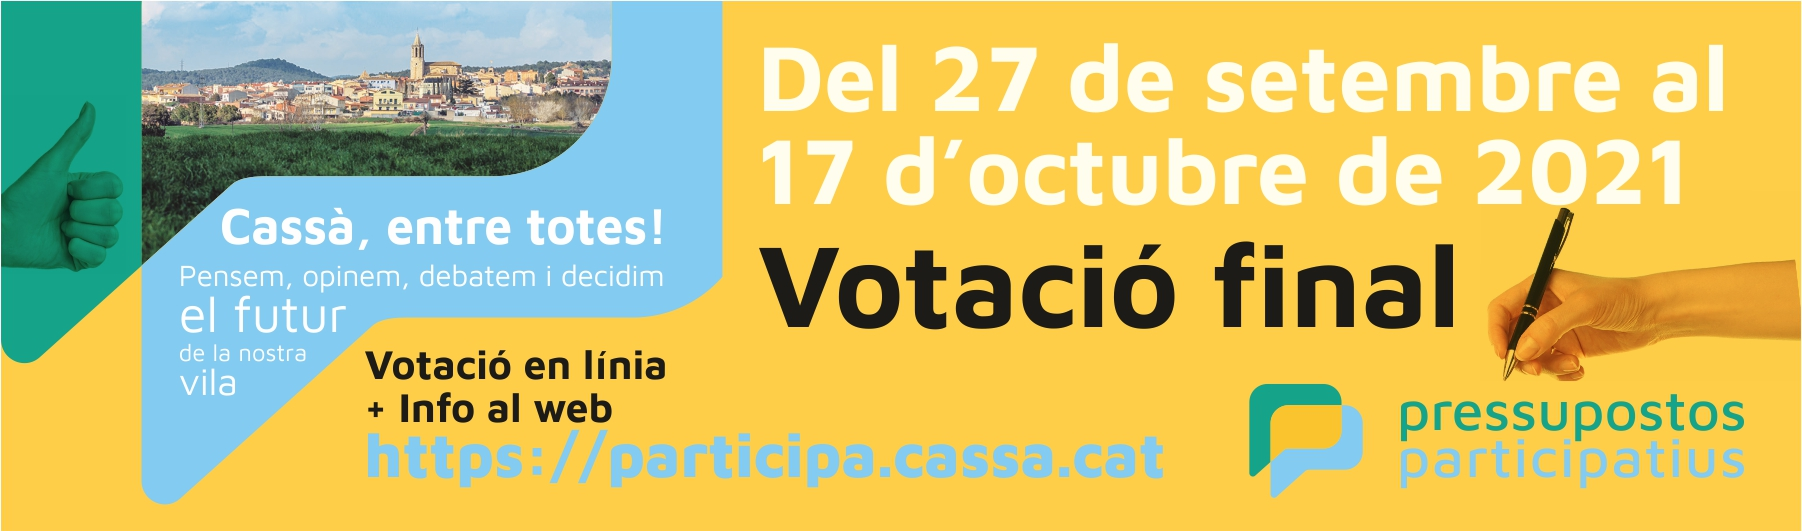 2021_-_Pressupostos_votaci_final